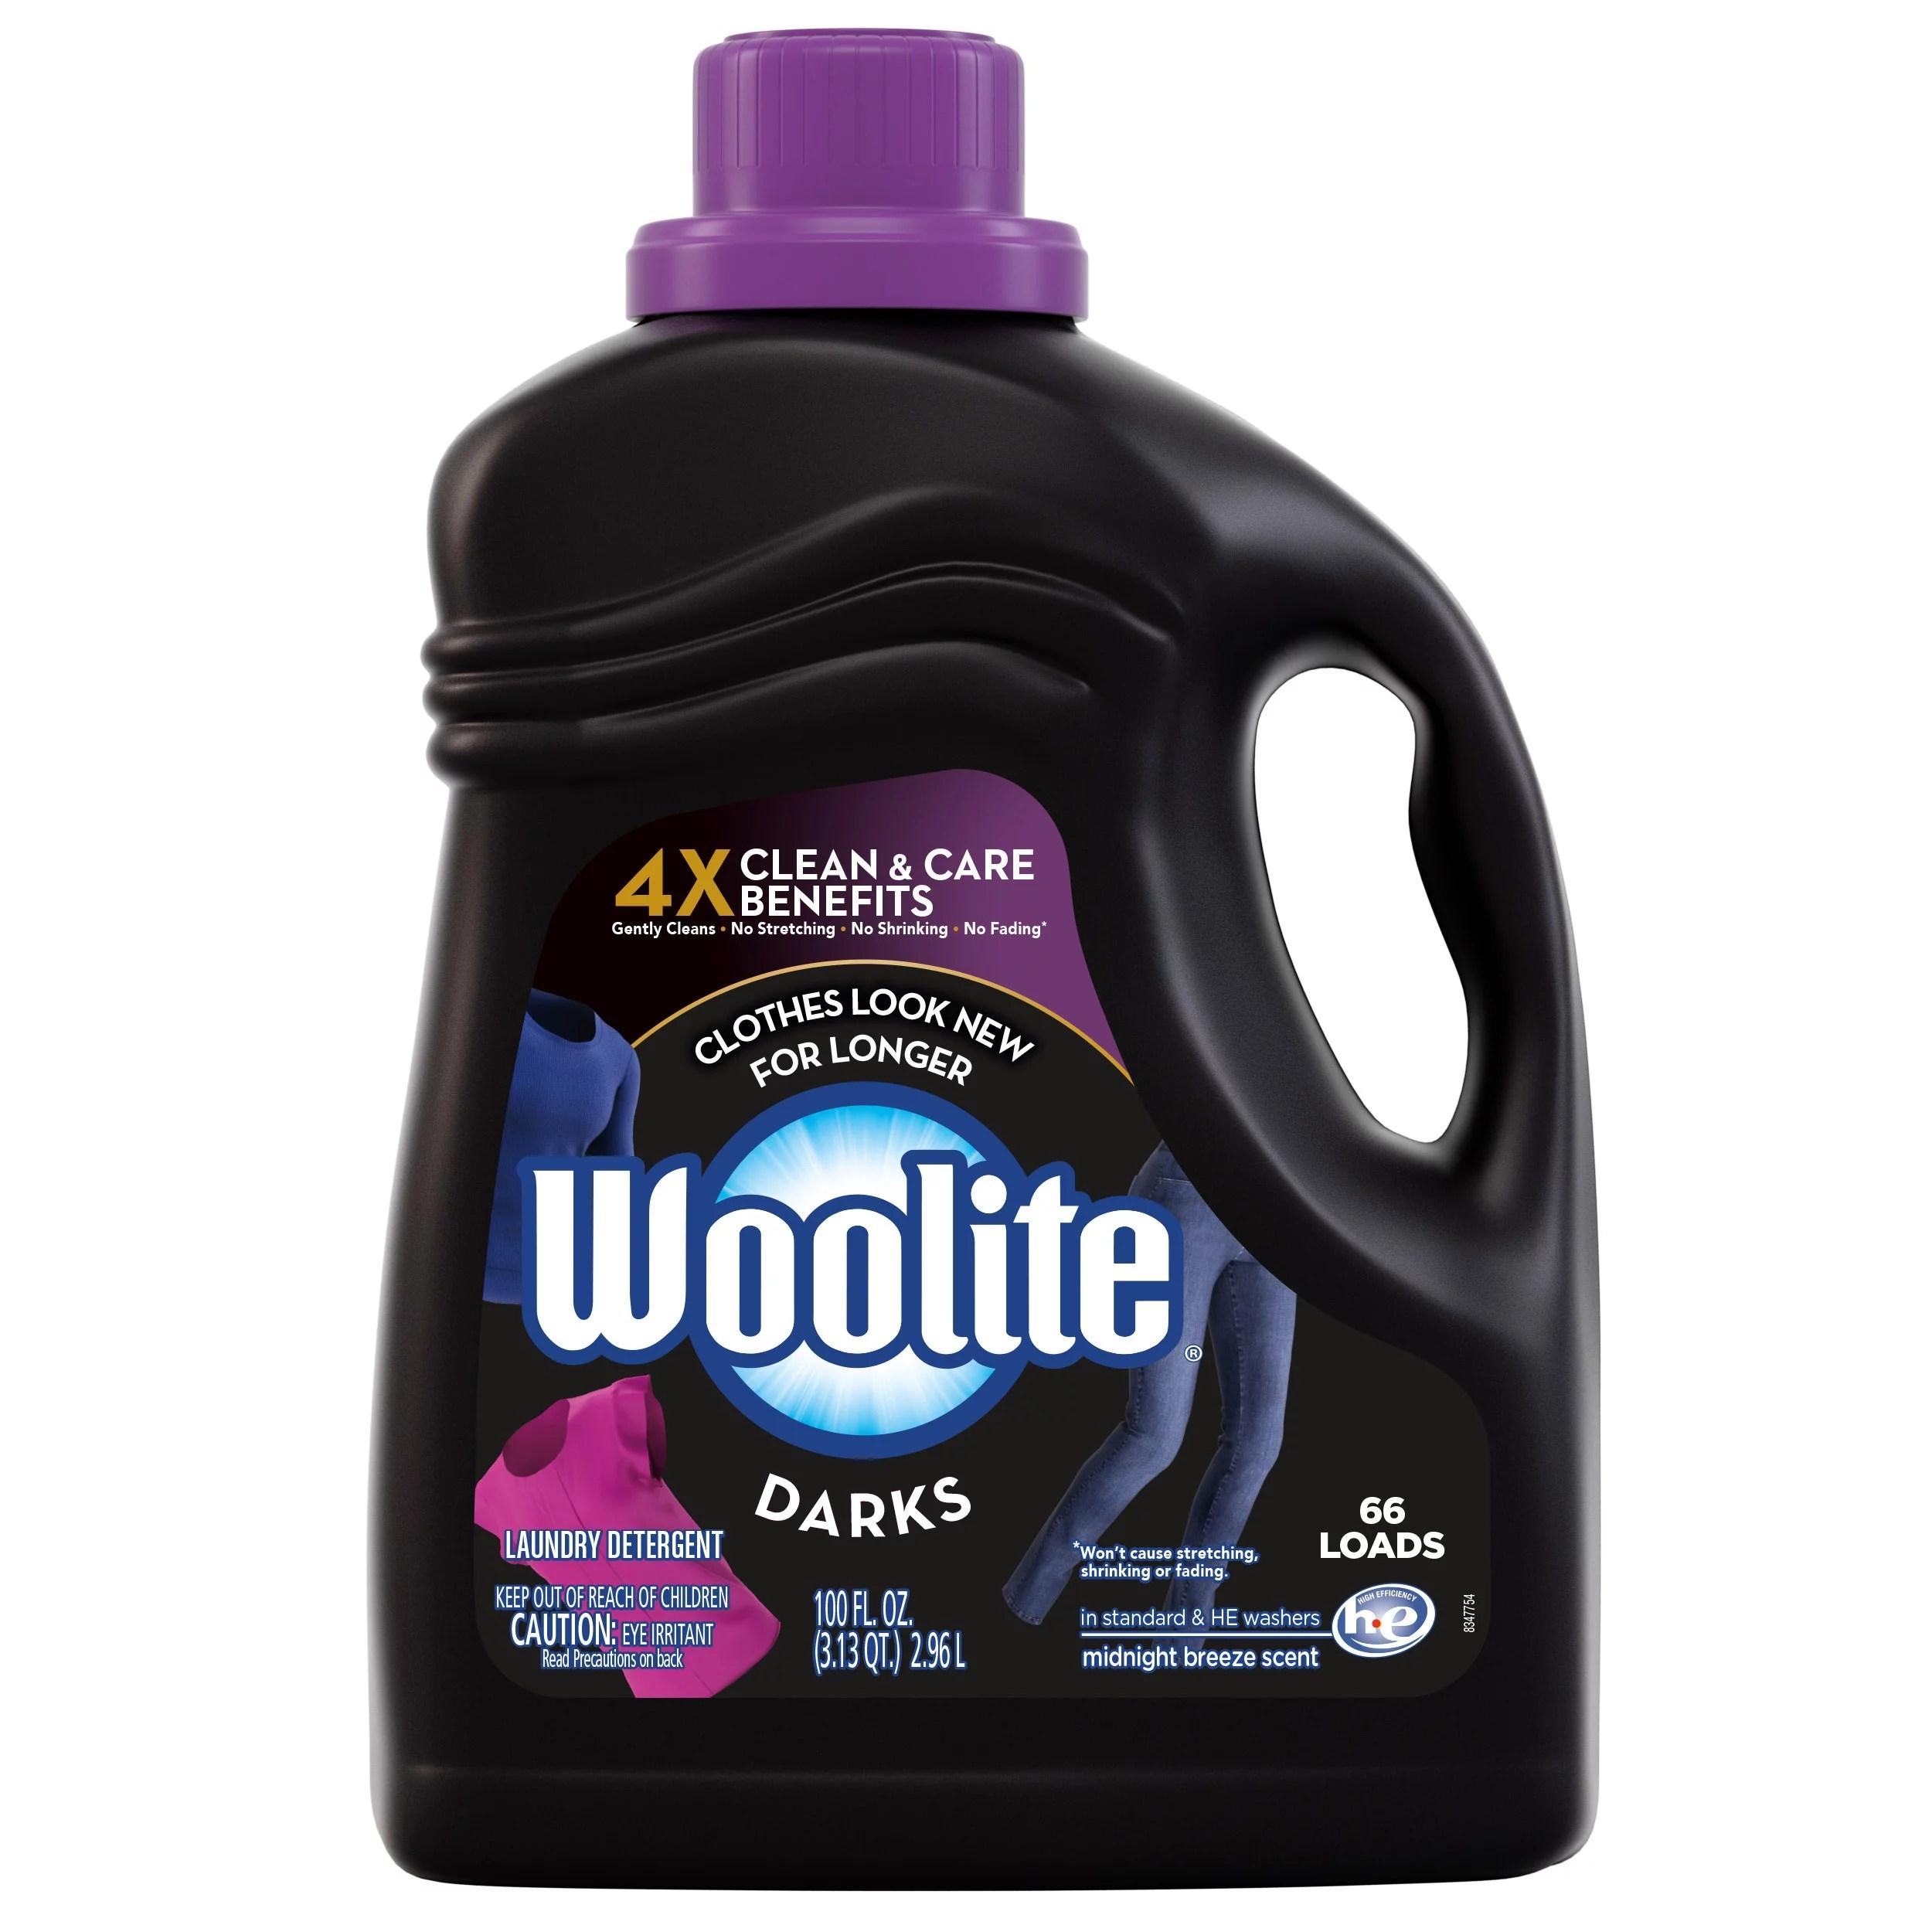 woolite darks liquid laundry